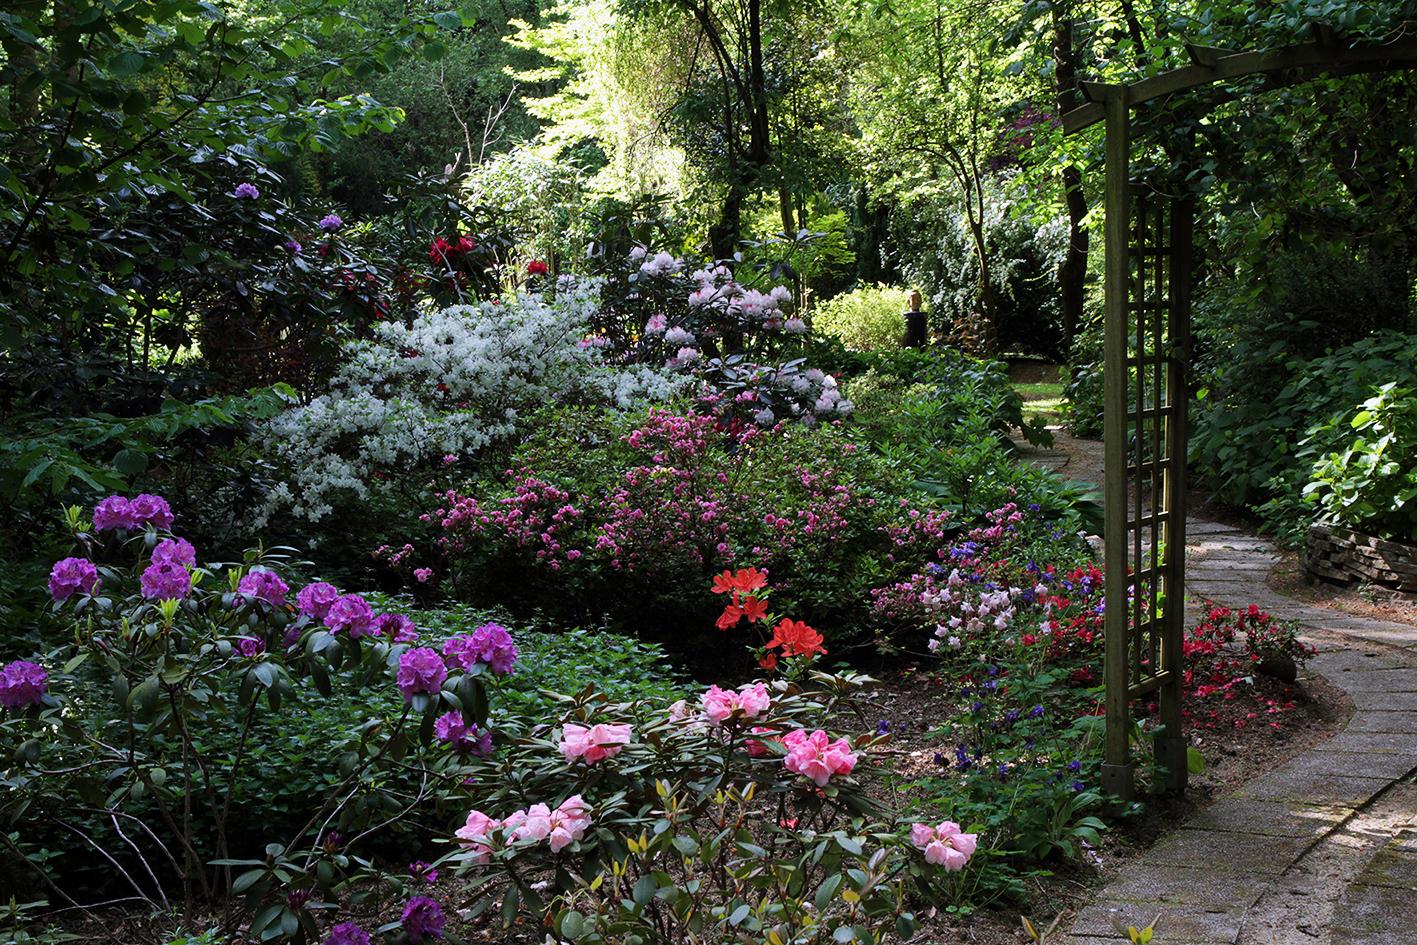 jardins du mont des r collets beaux jardins et potagers. Black Bedroom Furniture Sets. Home Design Ideas